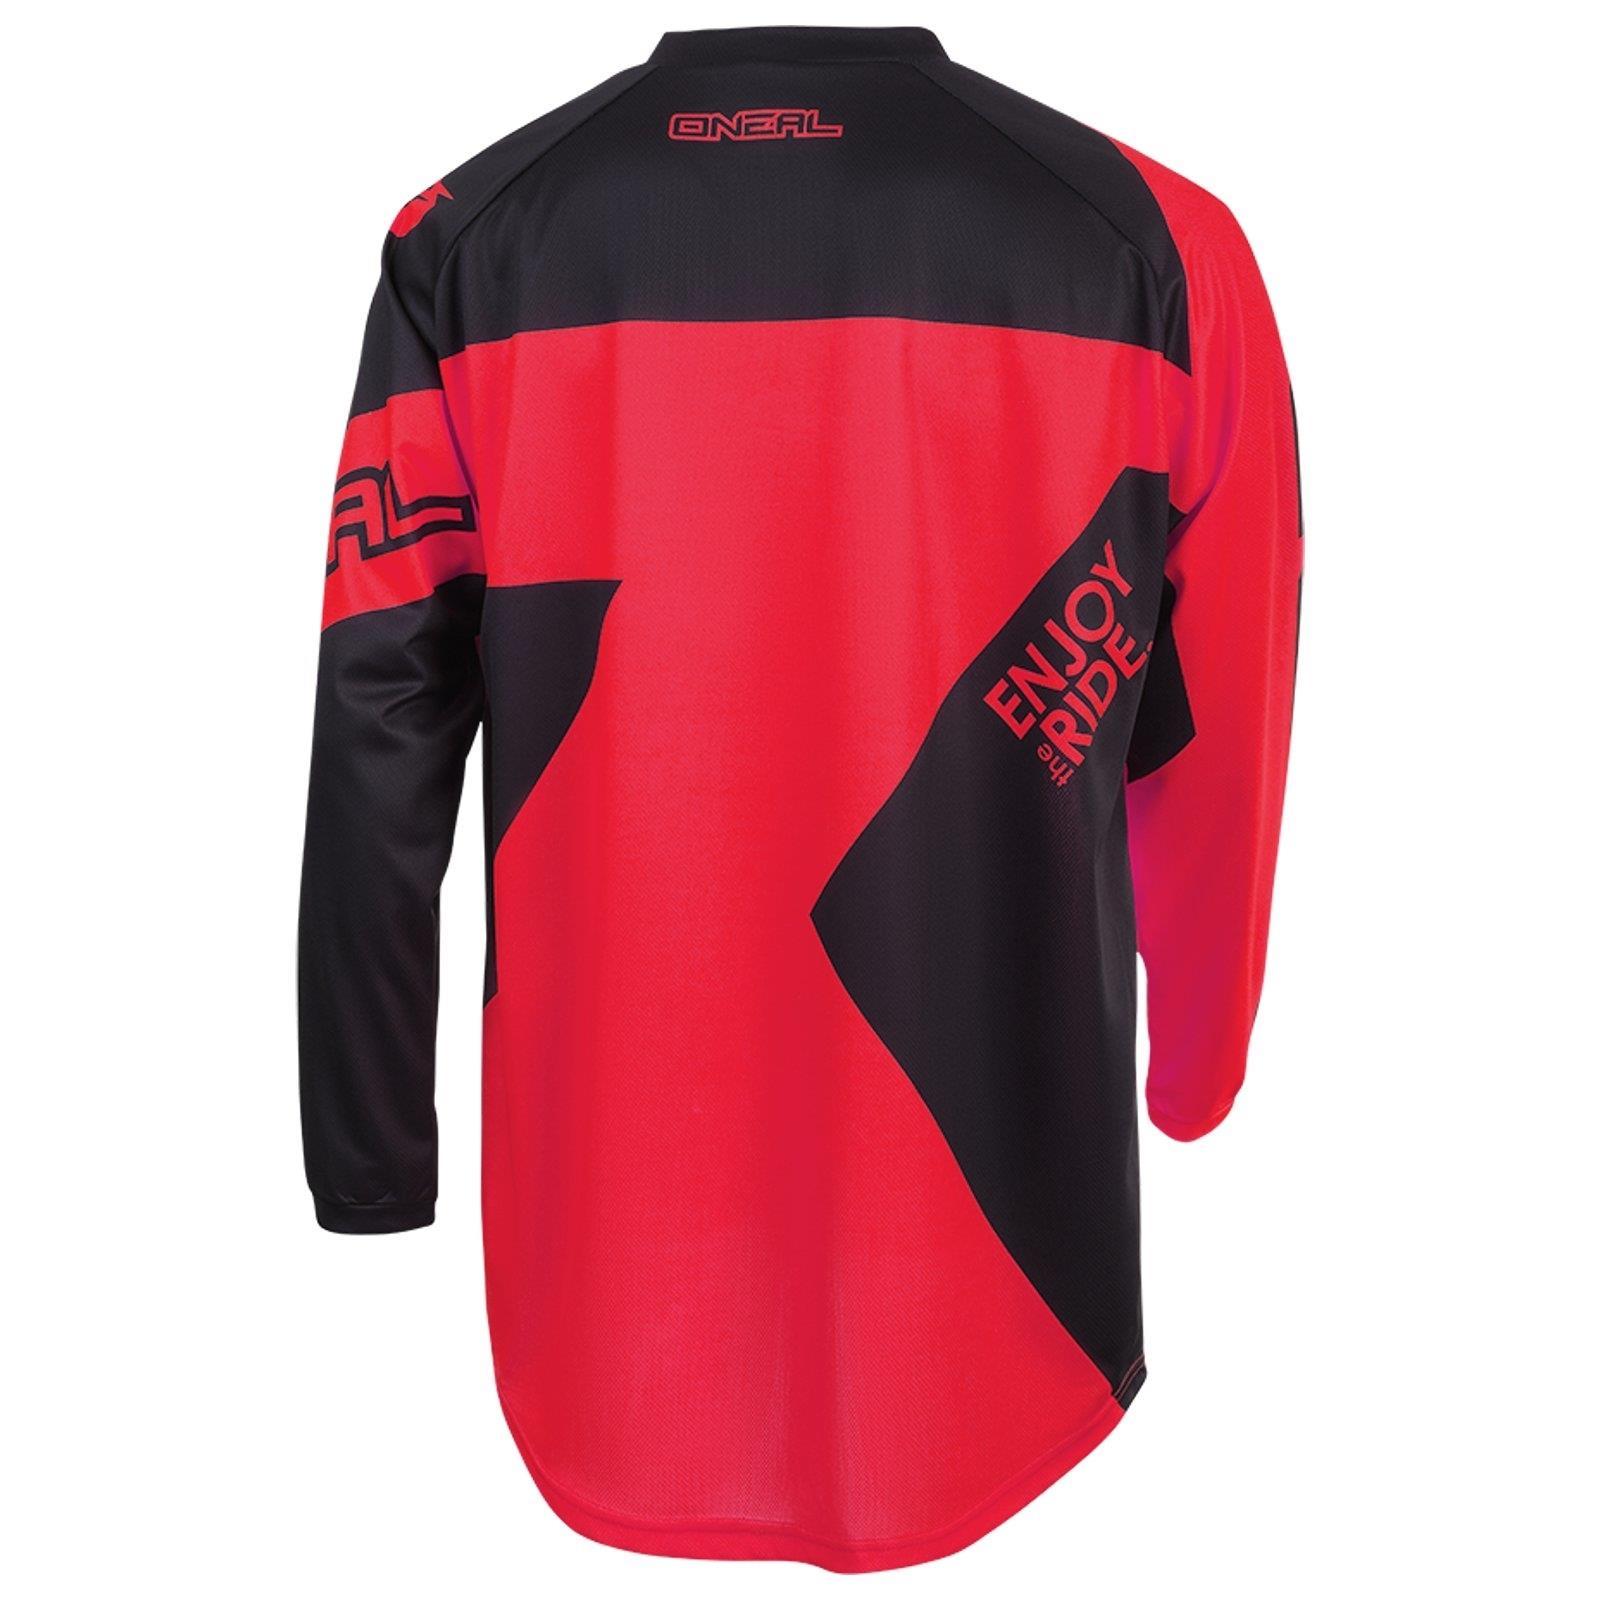 O-039-Neal-elemento-Mayhem-JERSEY-Racewear-Motocross-Maglia-MX-DH-FR-MTB-MOUNTAIN-BIKE miniatura 60